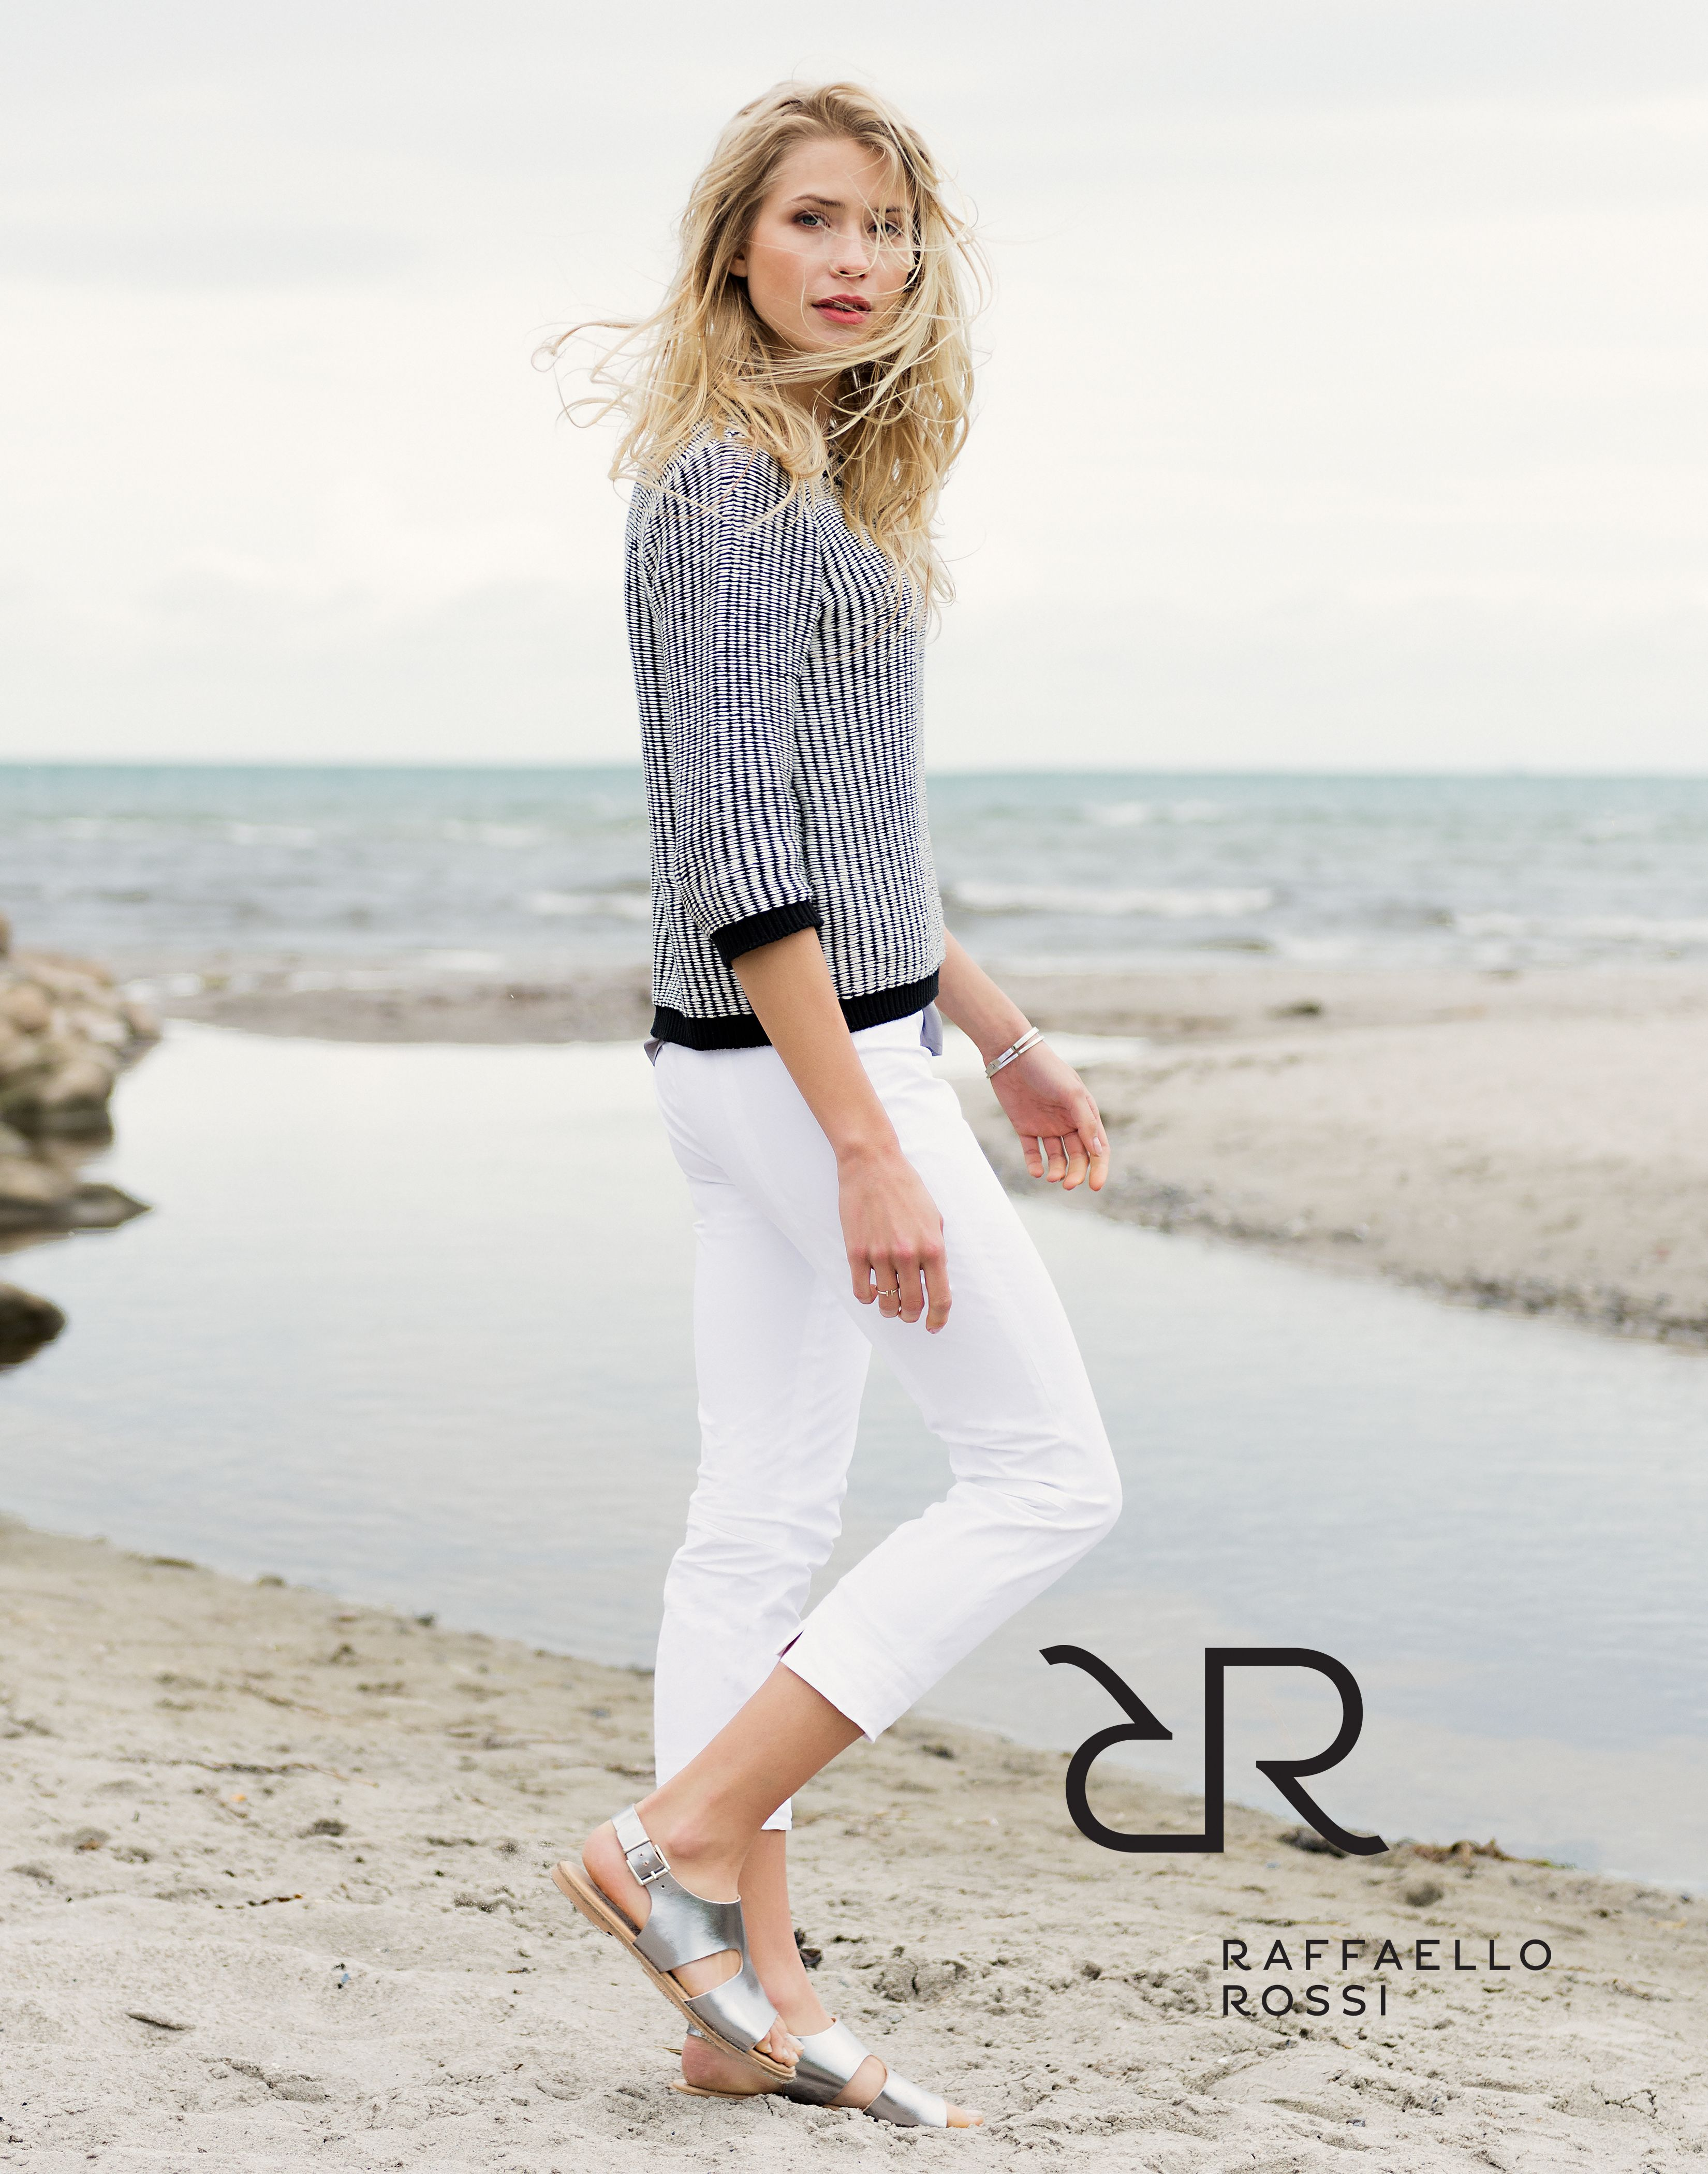 raffaello rossi penny 6 8 in white we love this pant raffaellorossi perfectfit trousers. Black Bedroom Furniture Sets. Home Design Ideas